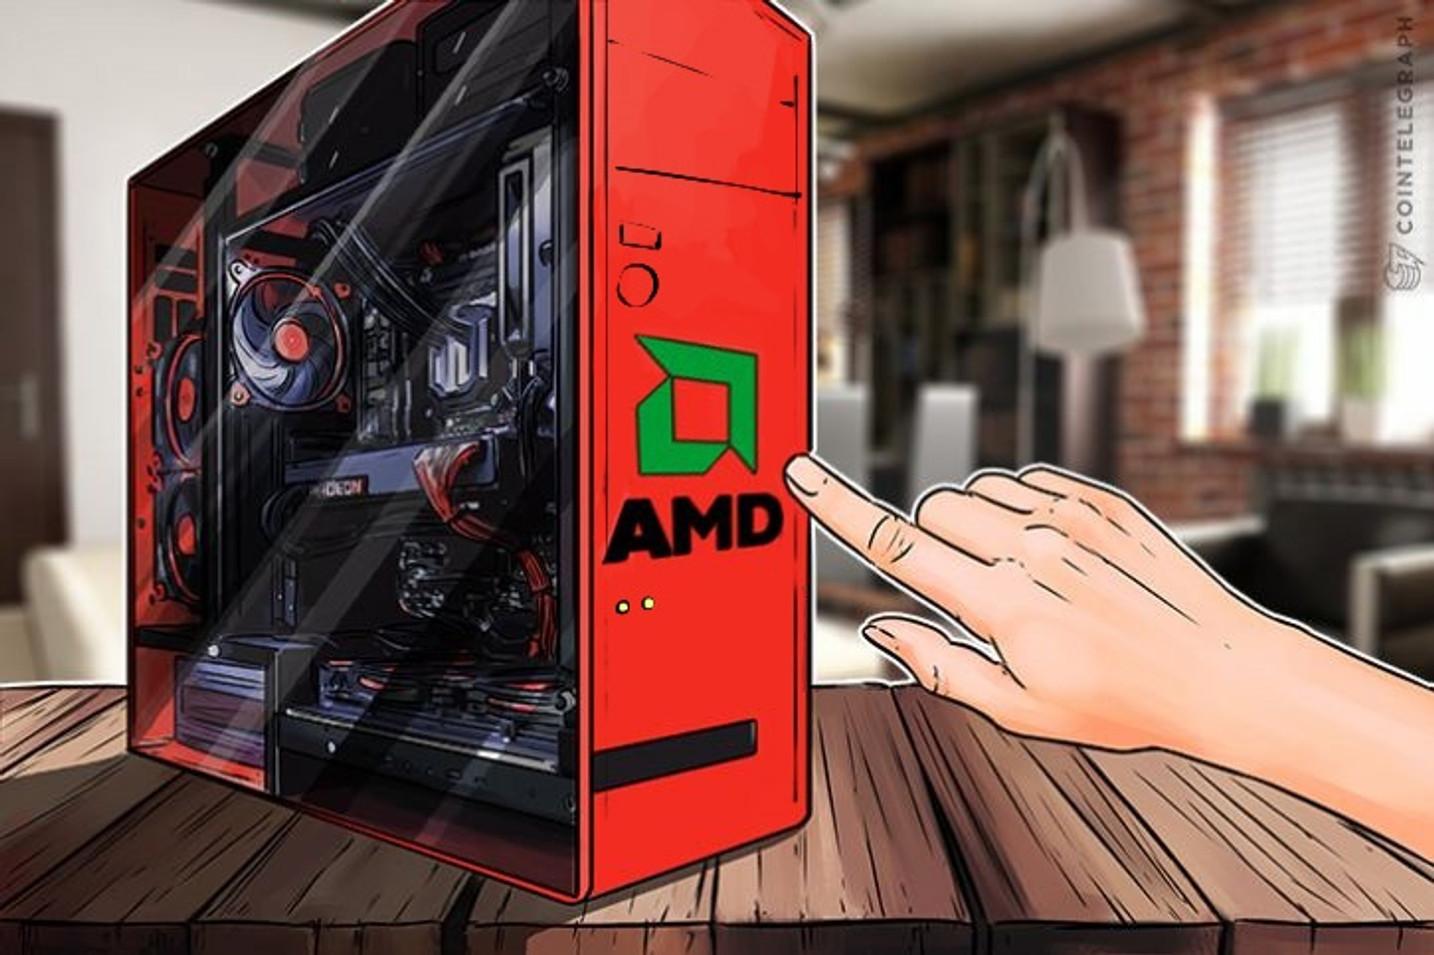 AMD Very Willing to Participate in Blockchain, CEO Lisa Su